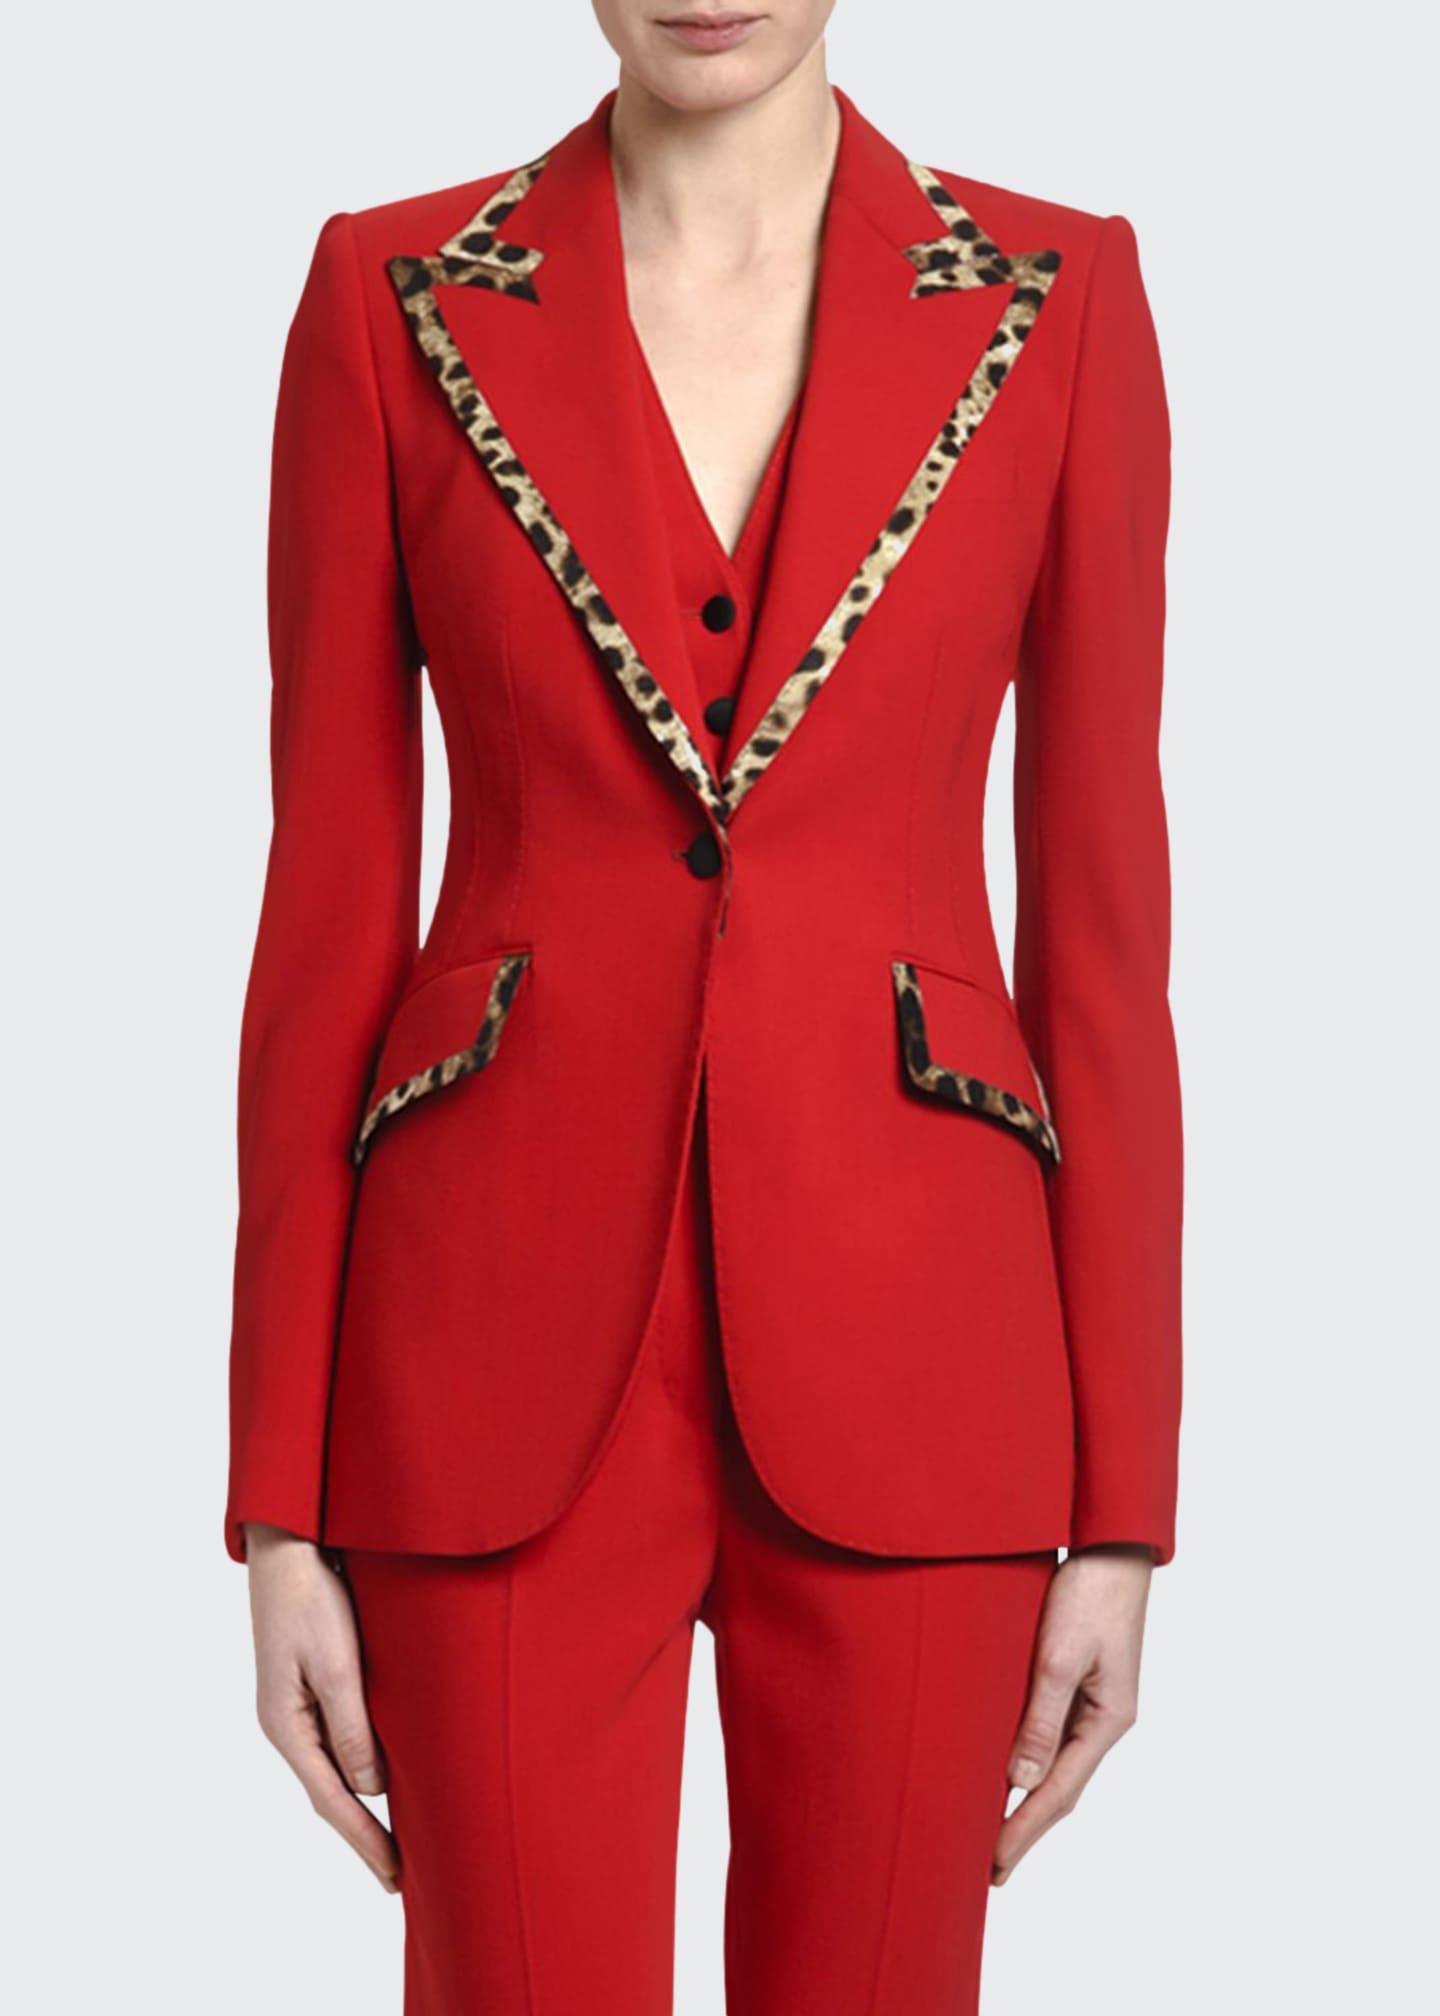 Dolce & Gabbana Leopard-Trimmed Wool Blazer